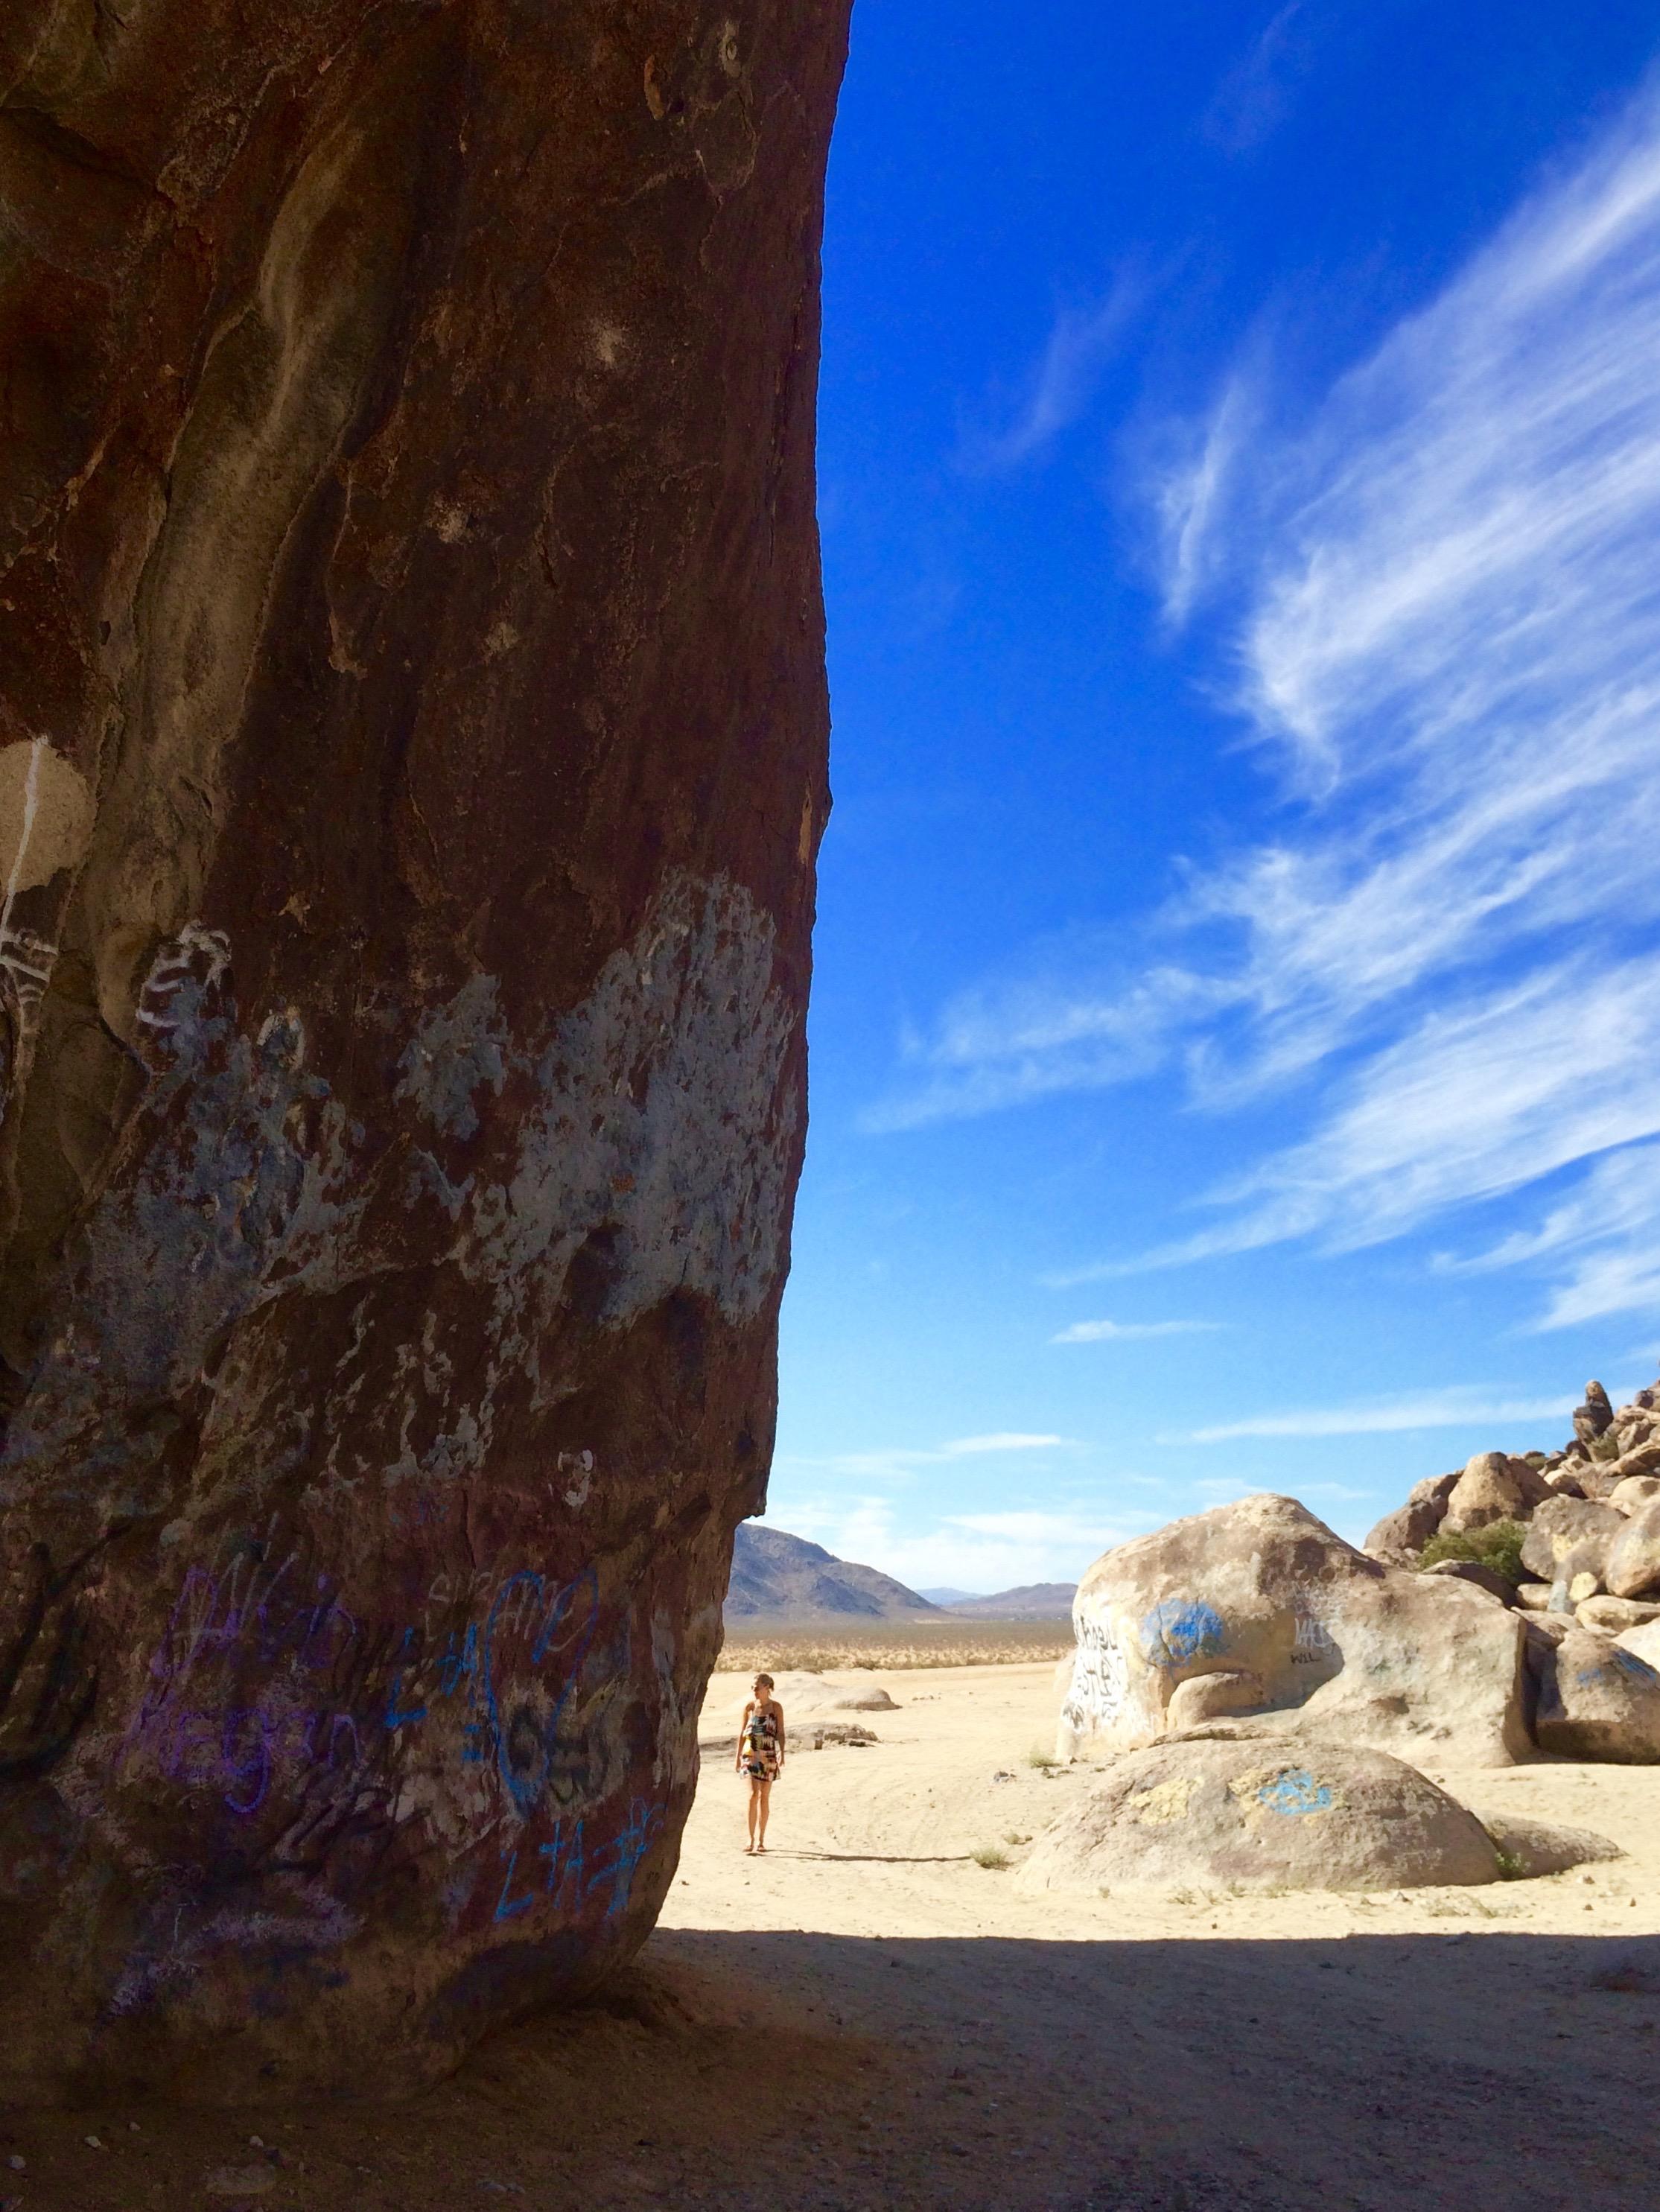 Alien Landing Strip and Giant Boulder, Joshua Tree California - 3 Days*